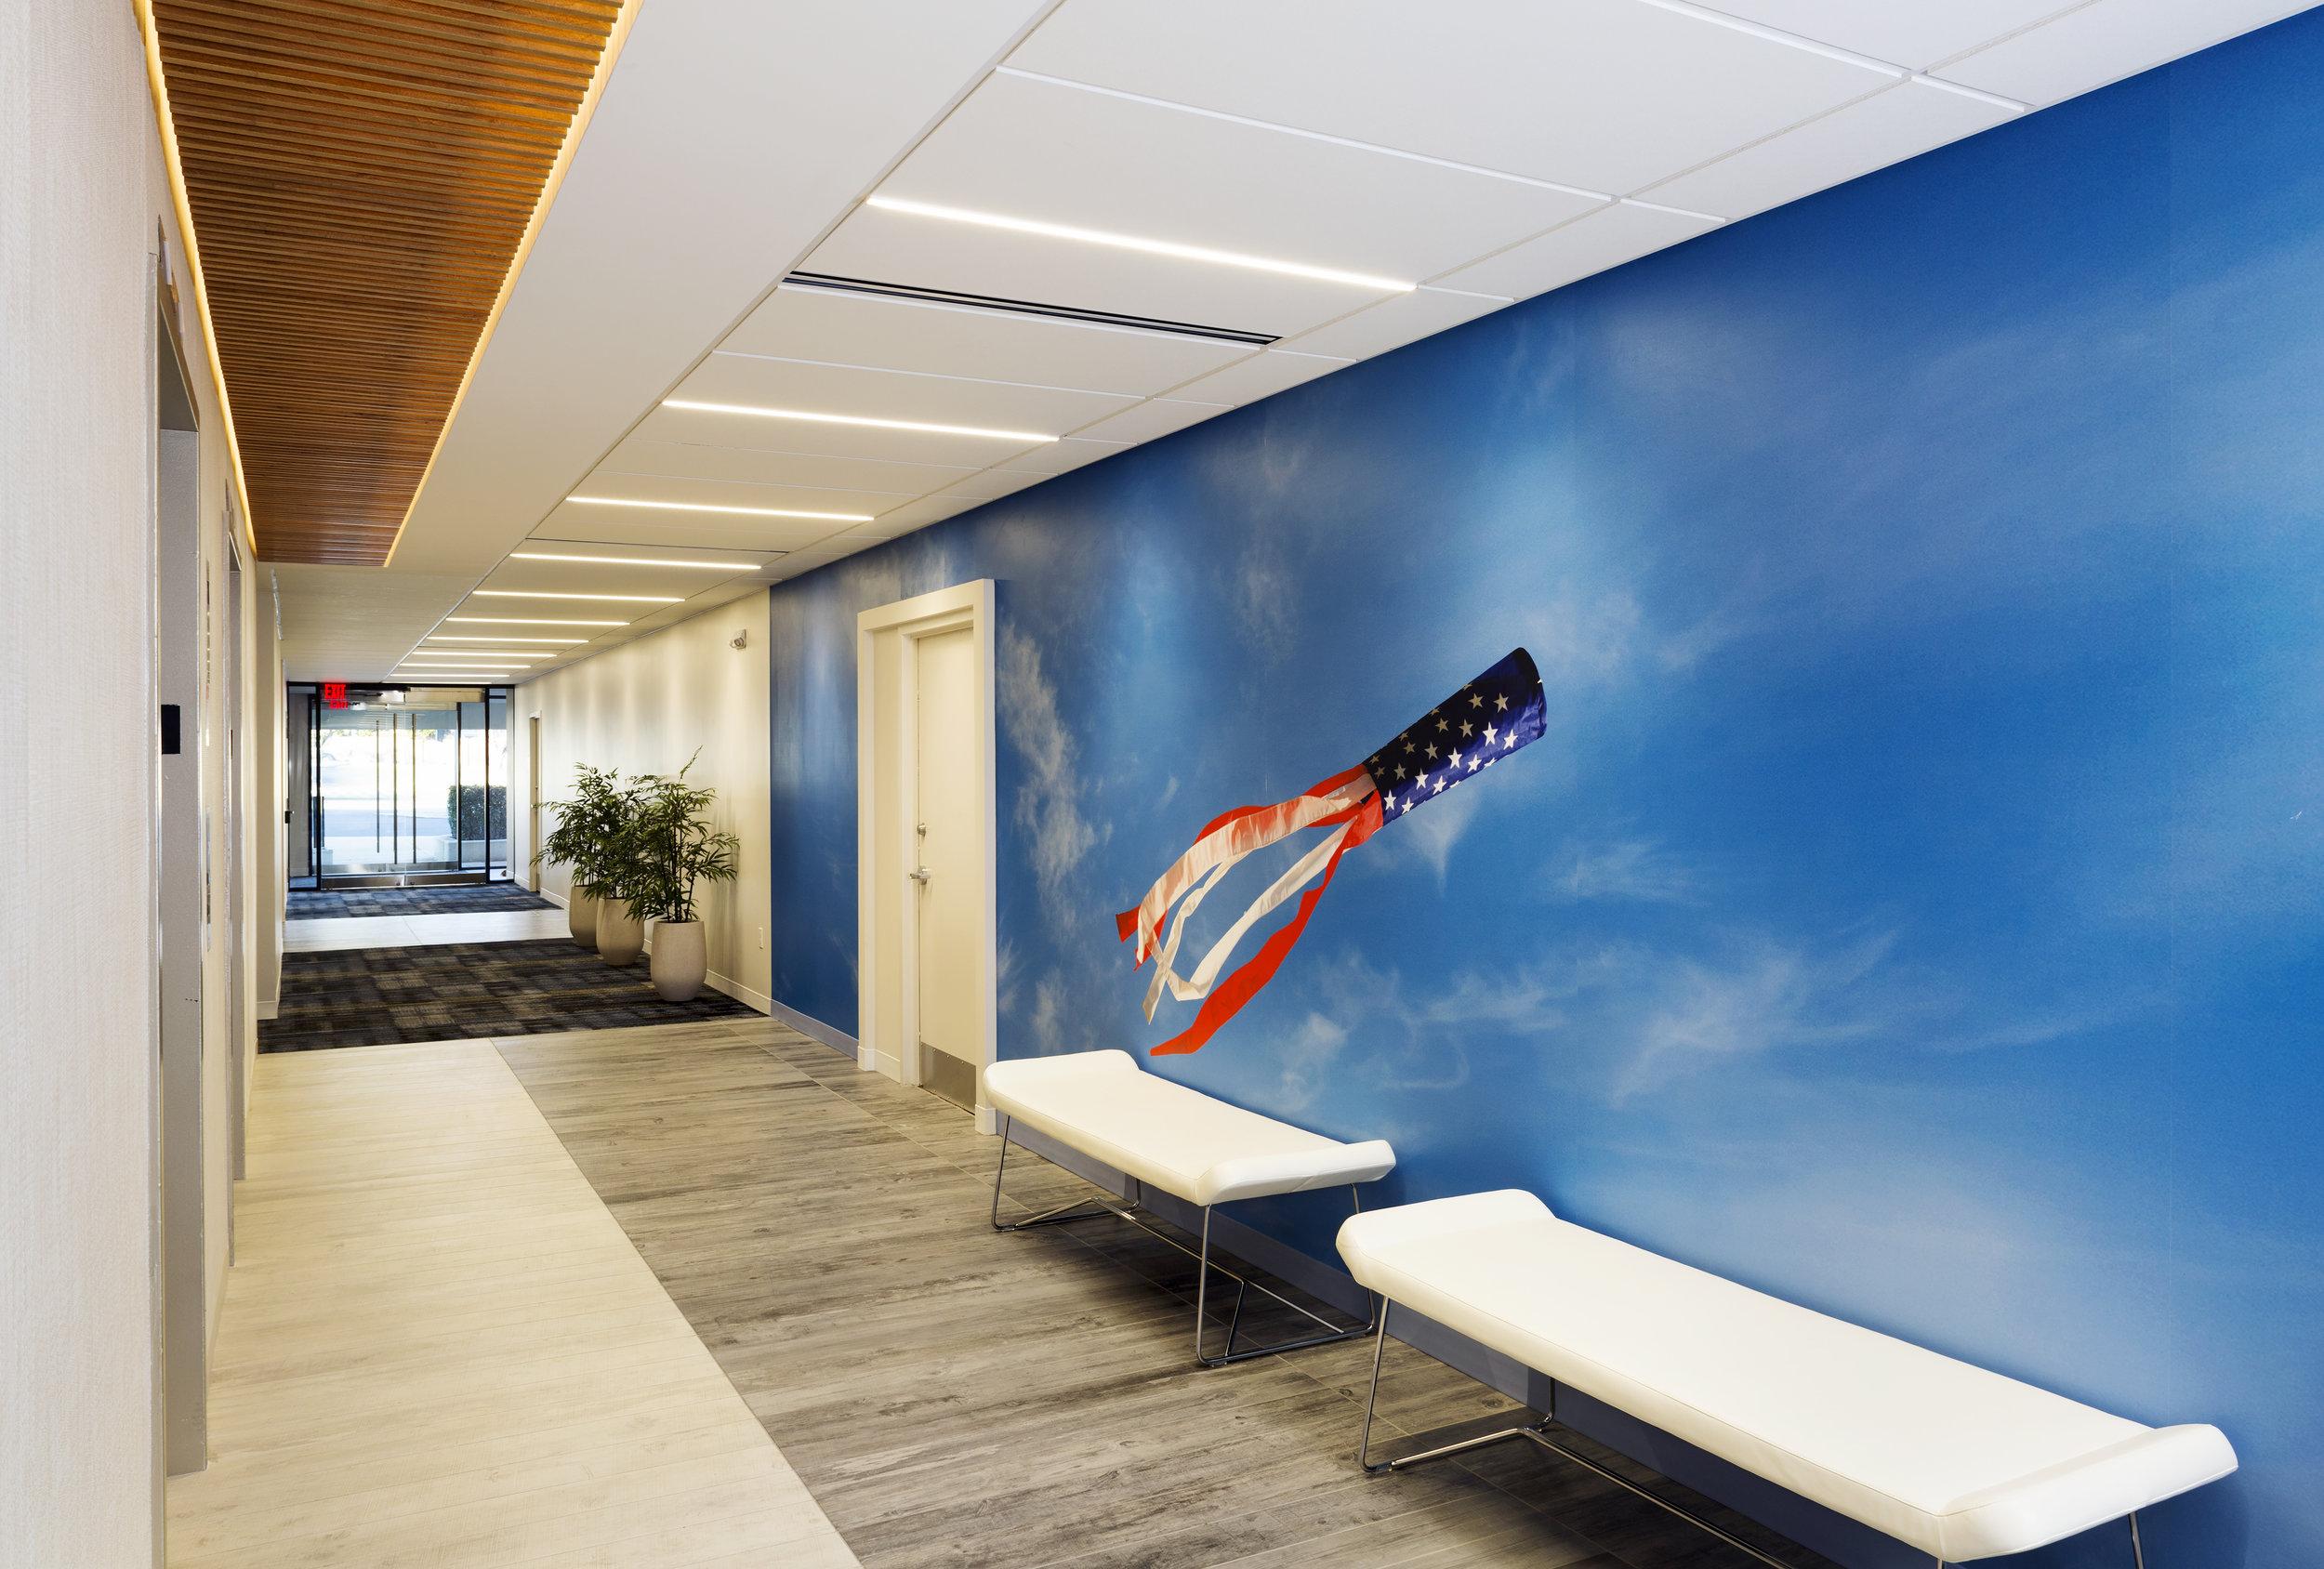 Medical Office Building, Annandale, VA